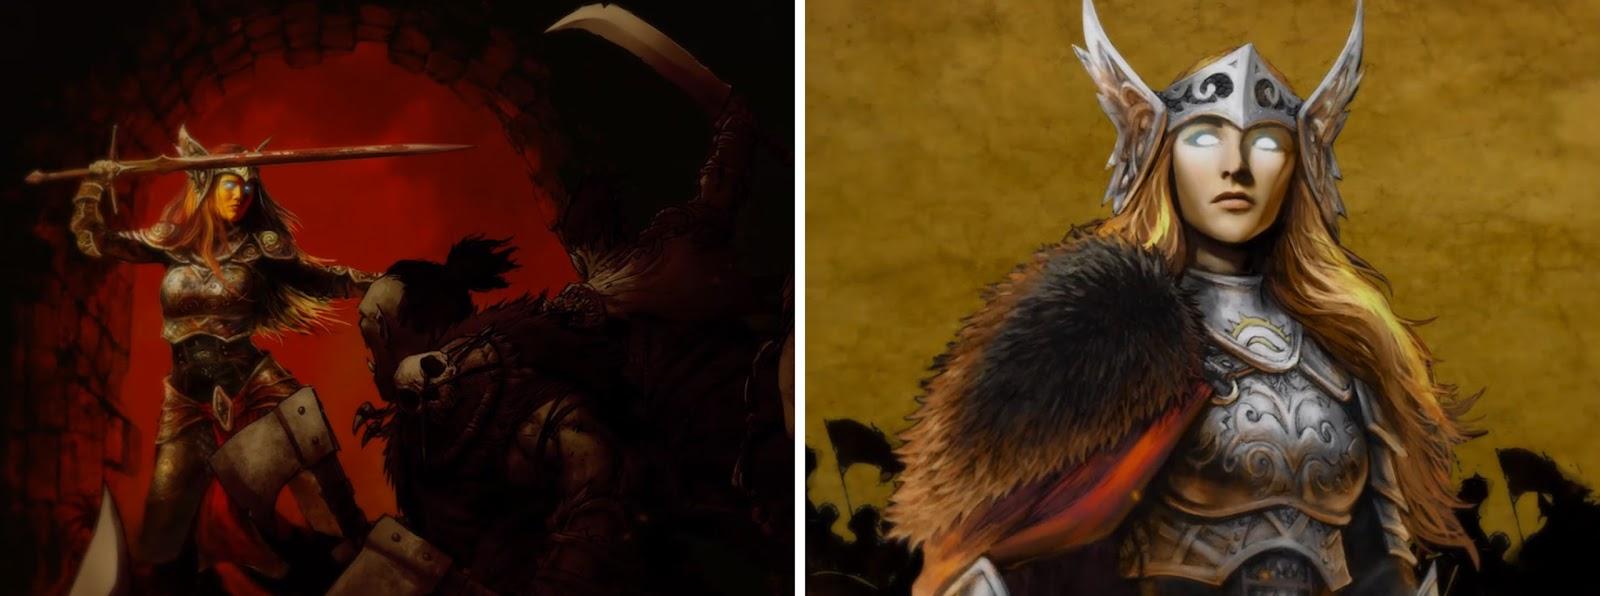 Siege of Dragonspear Walkthrough